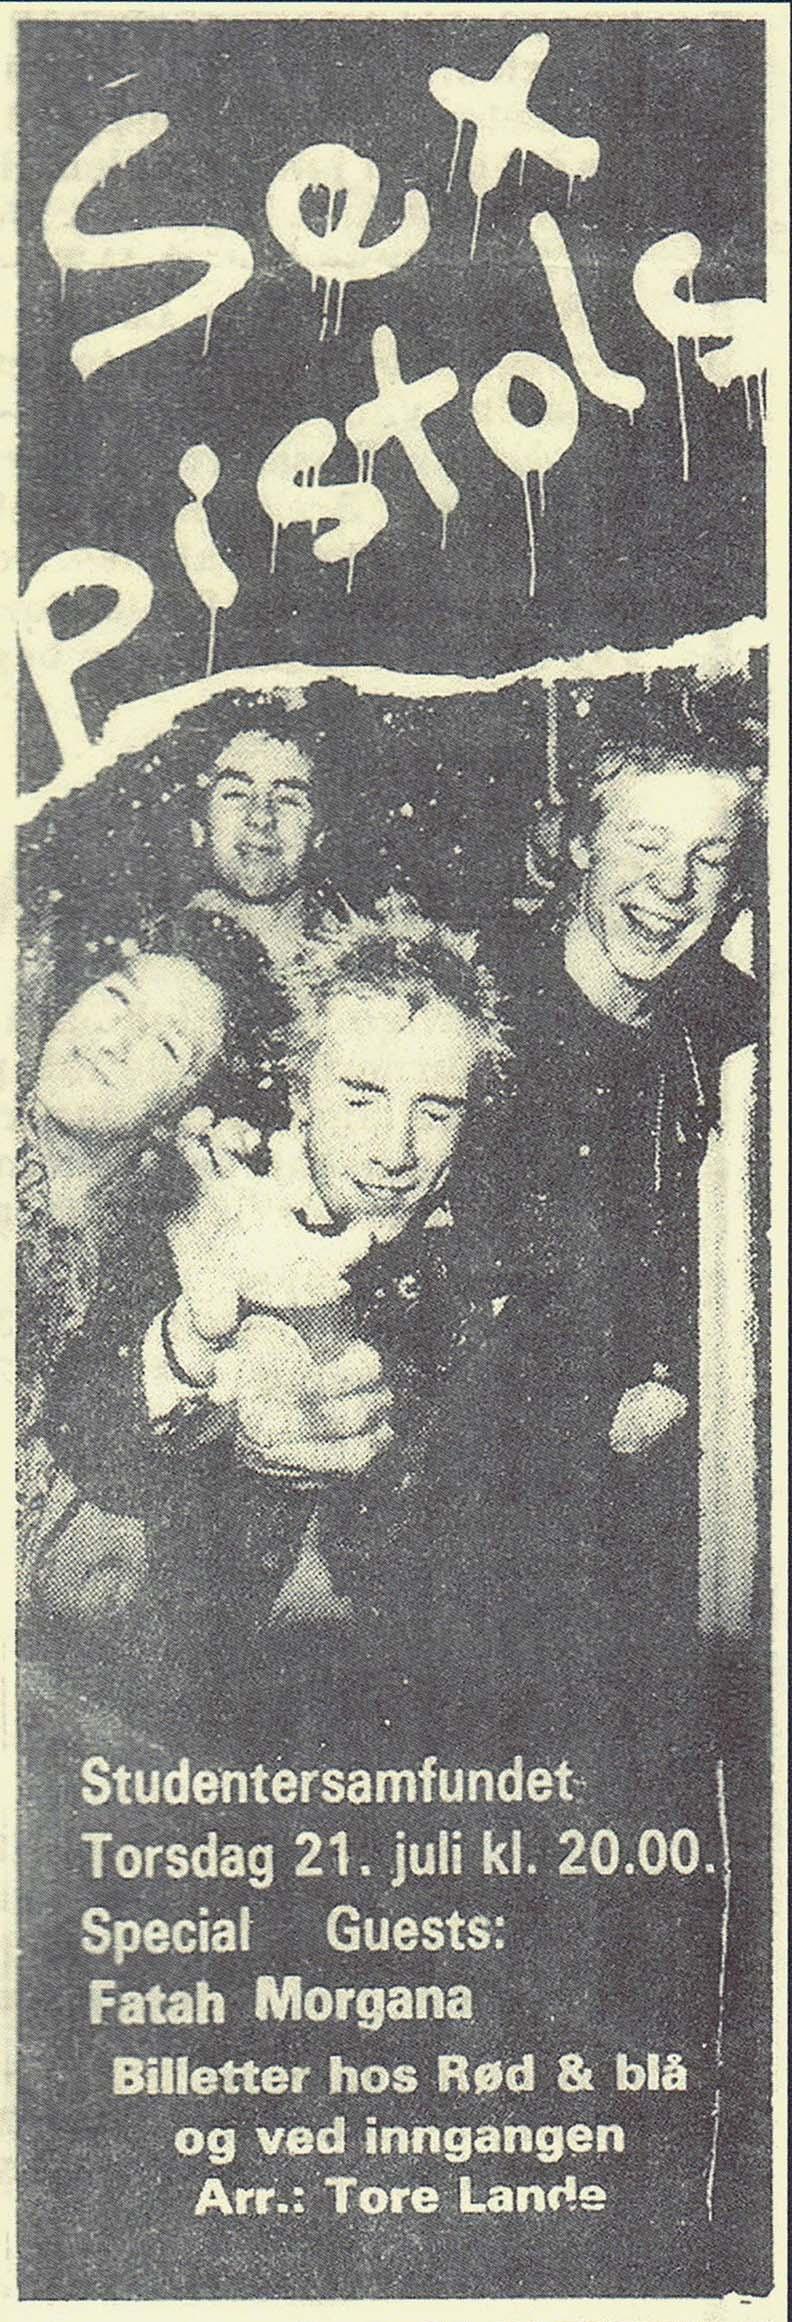 Studenter Samfundet, Trodheim, Norway, July 21st 1977 - Press Ad